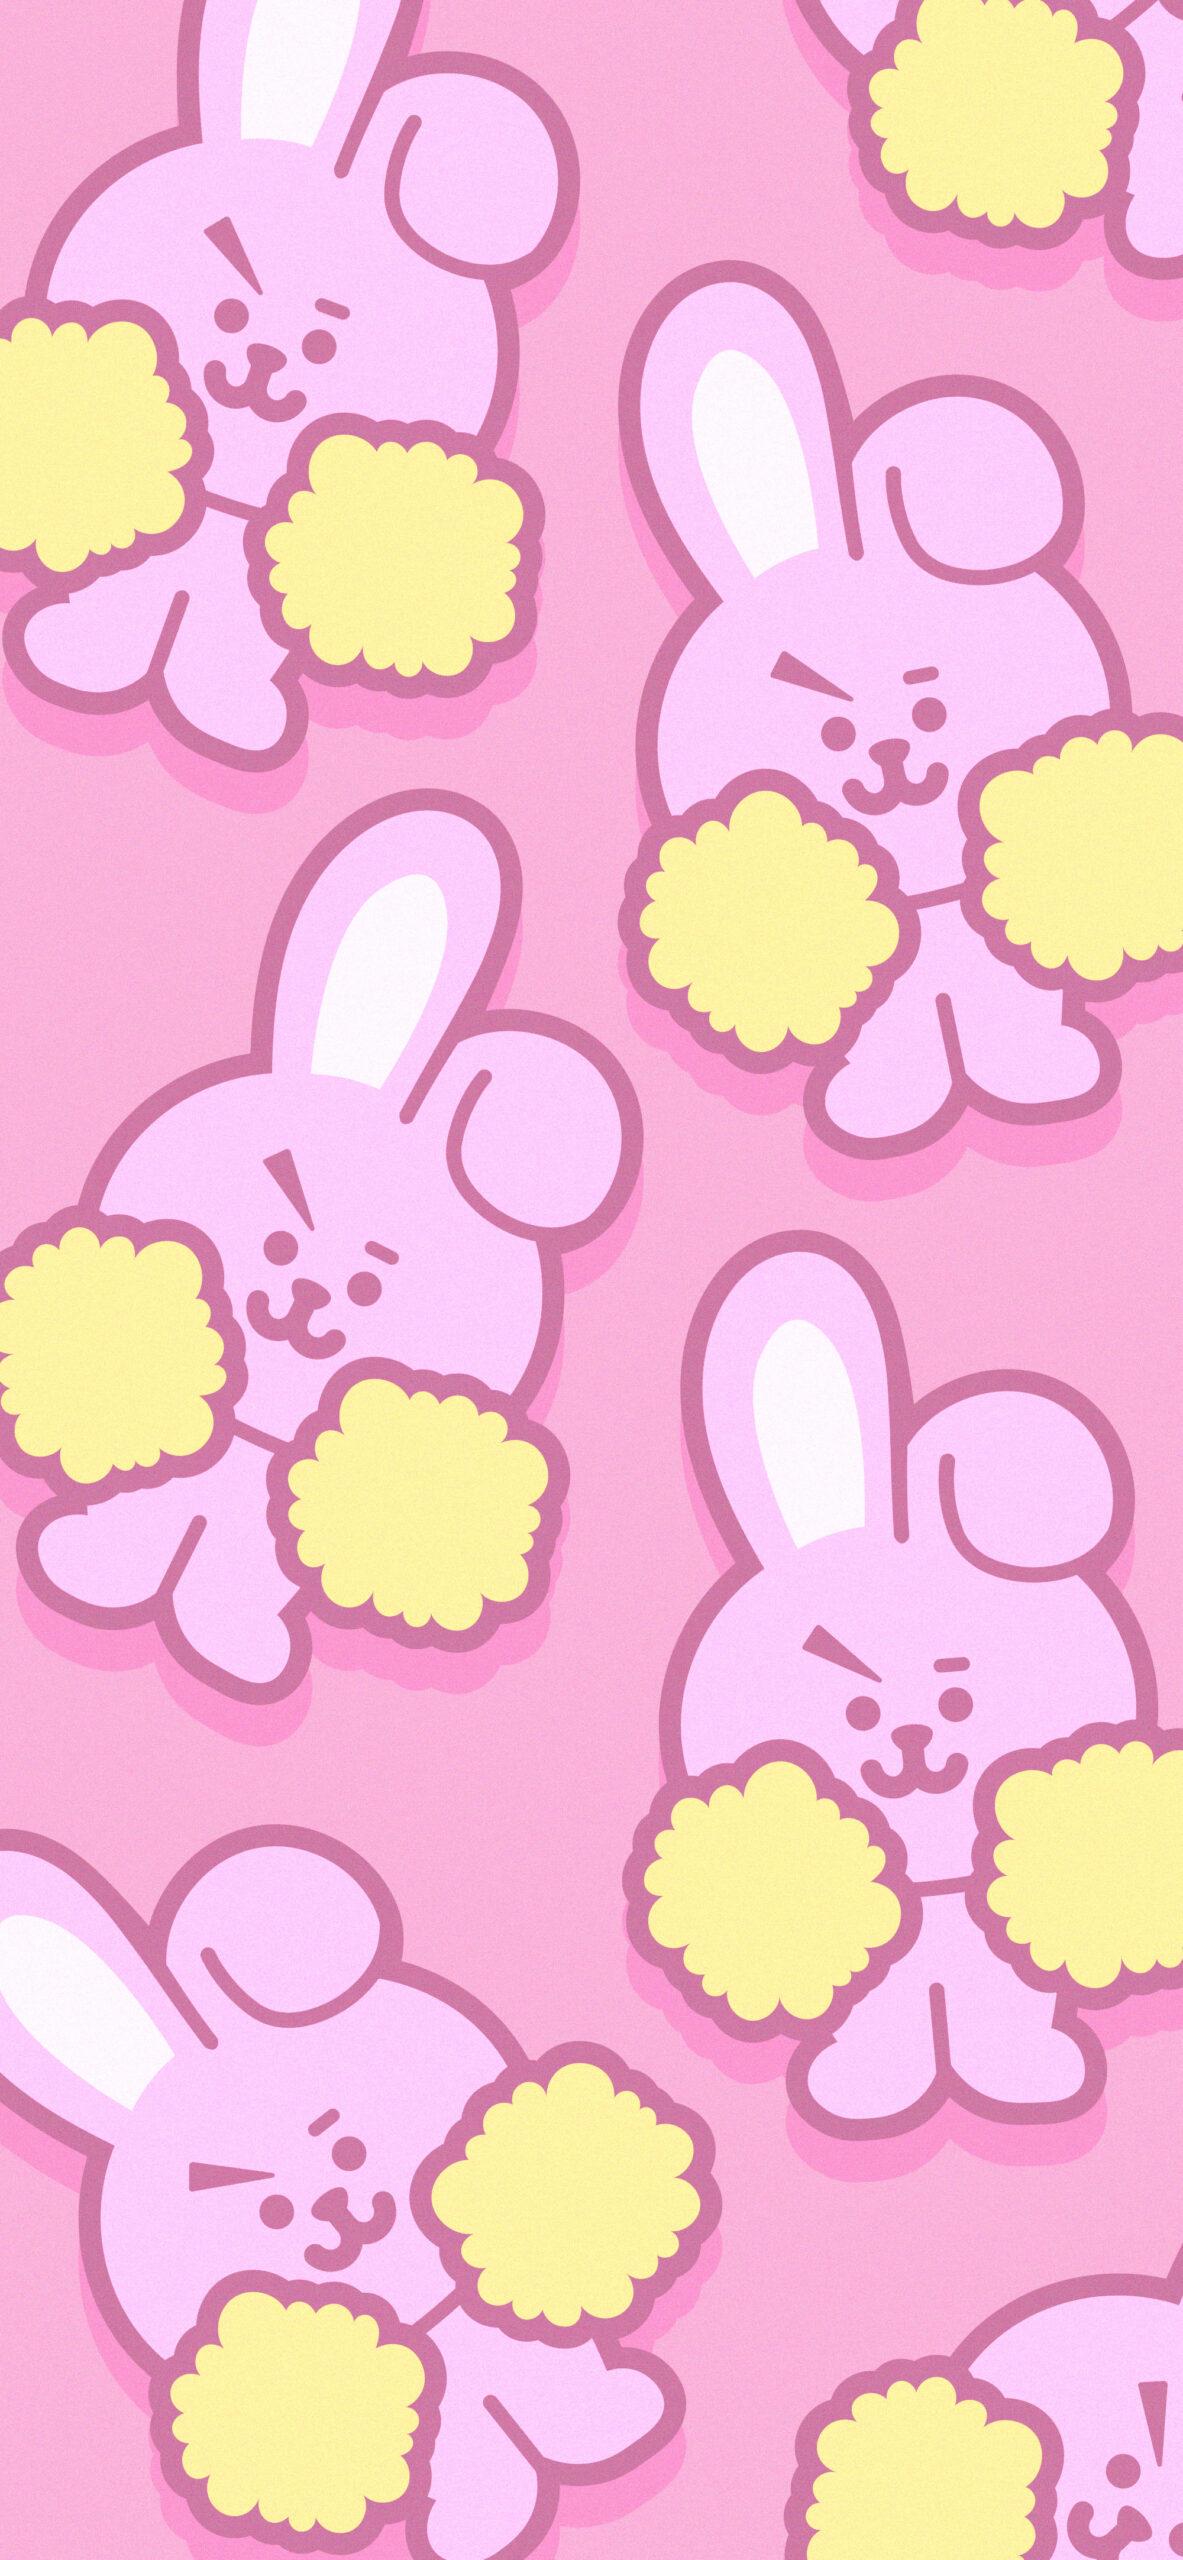 bts bt21 cooky pink background 2